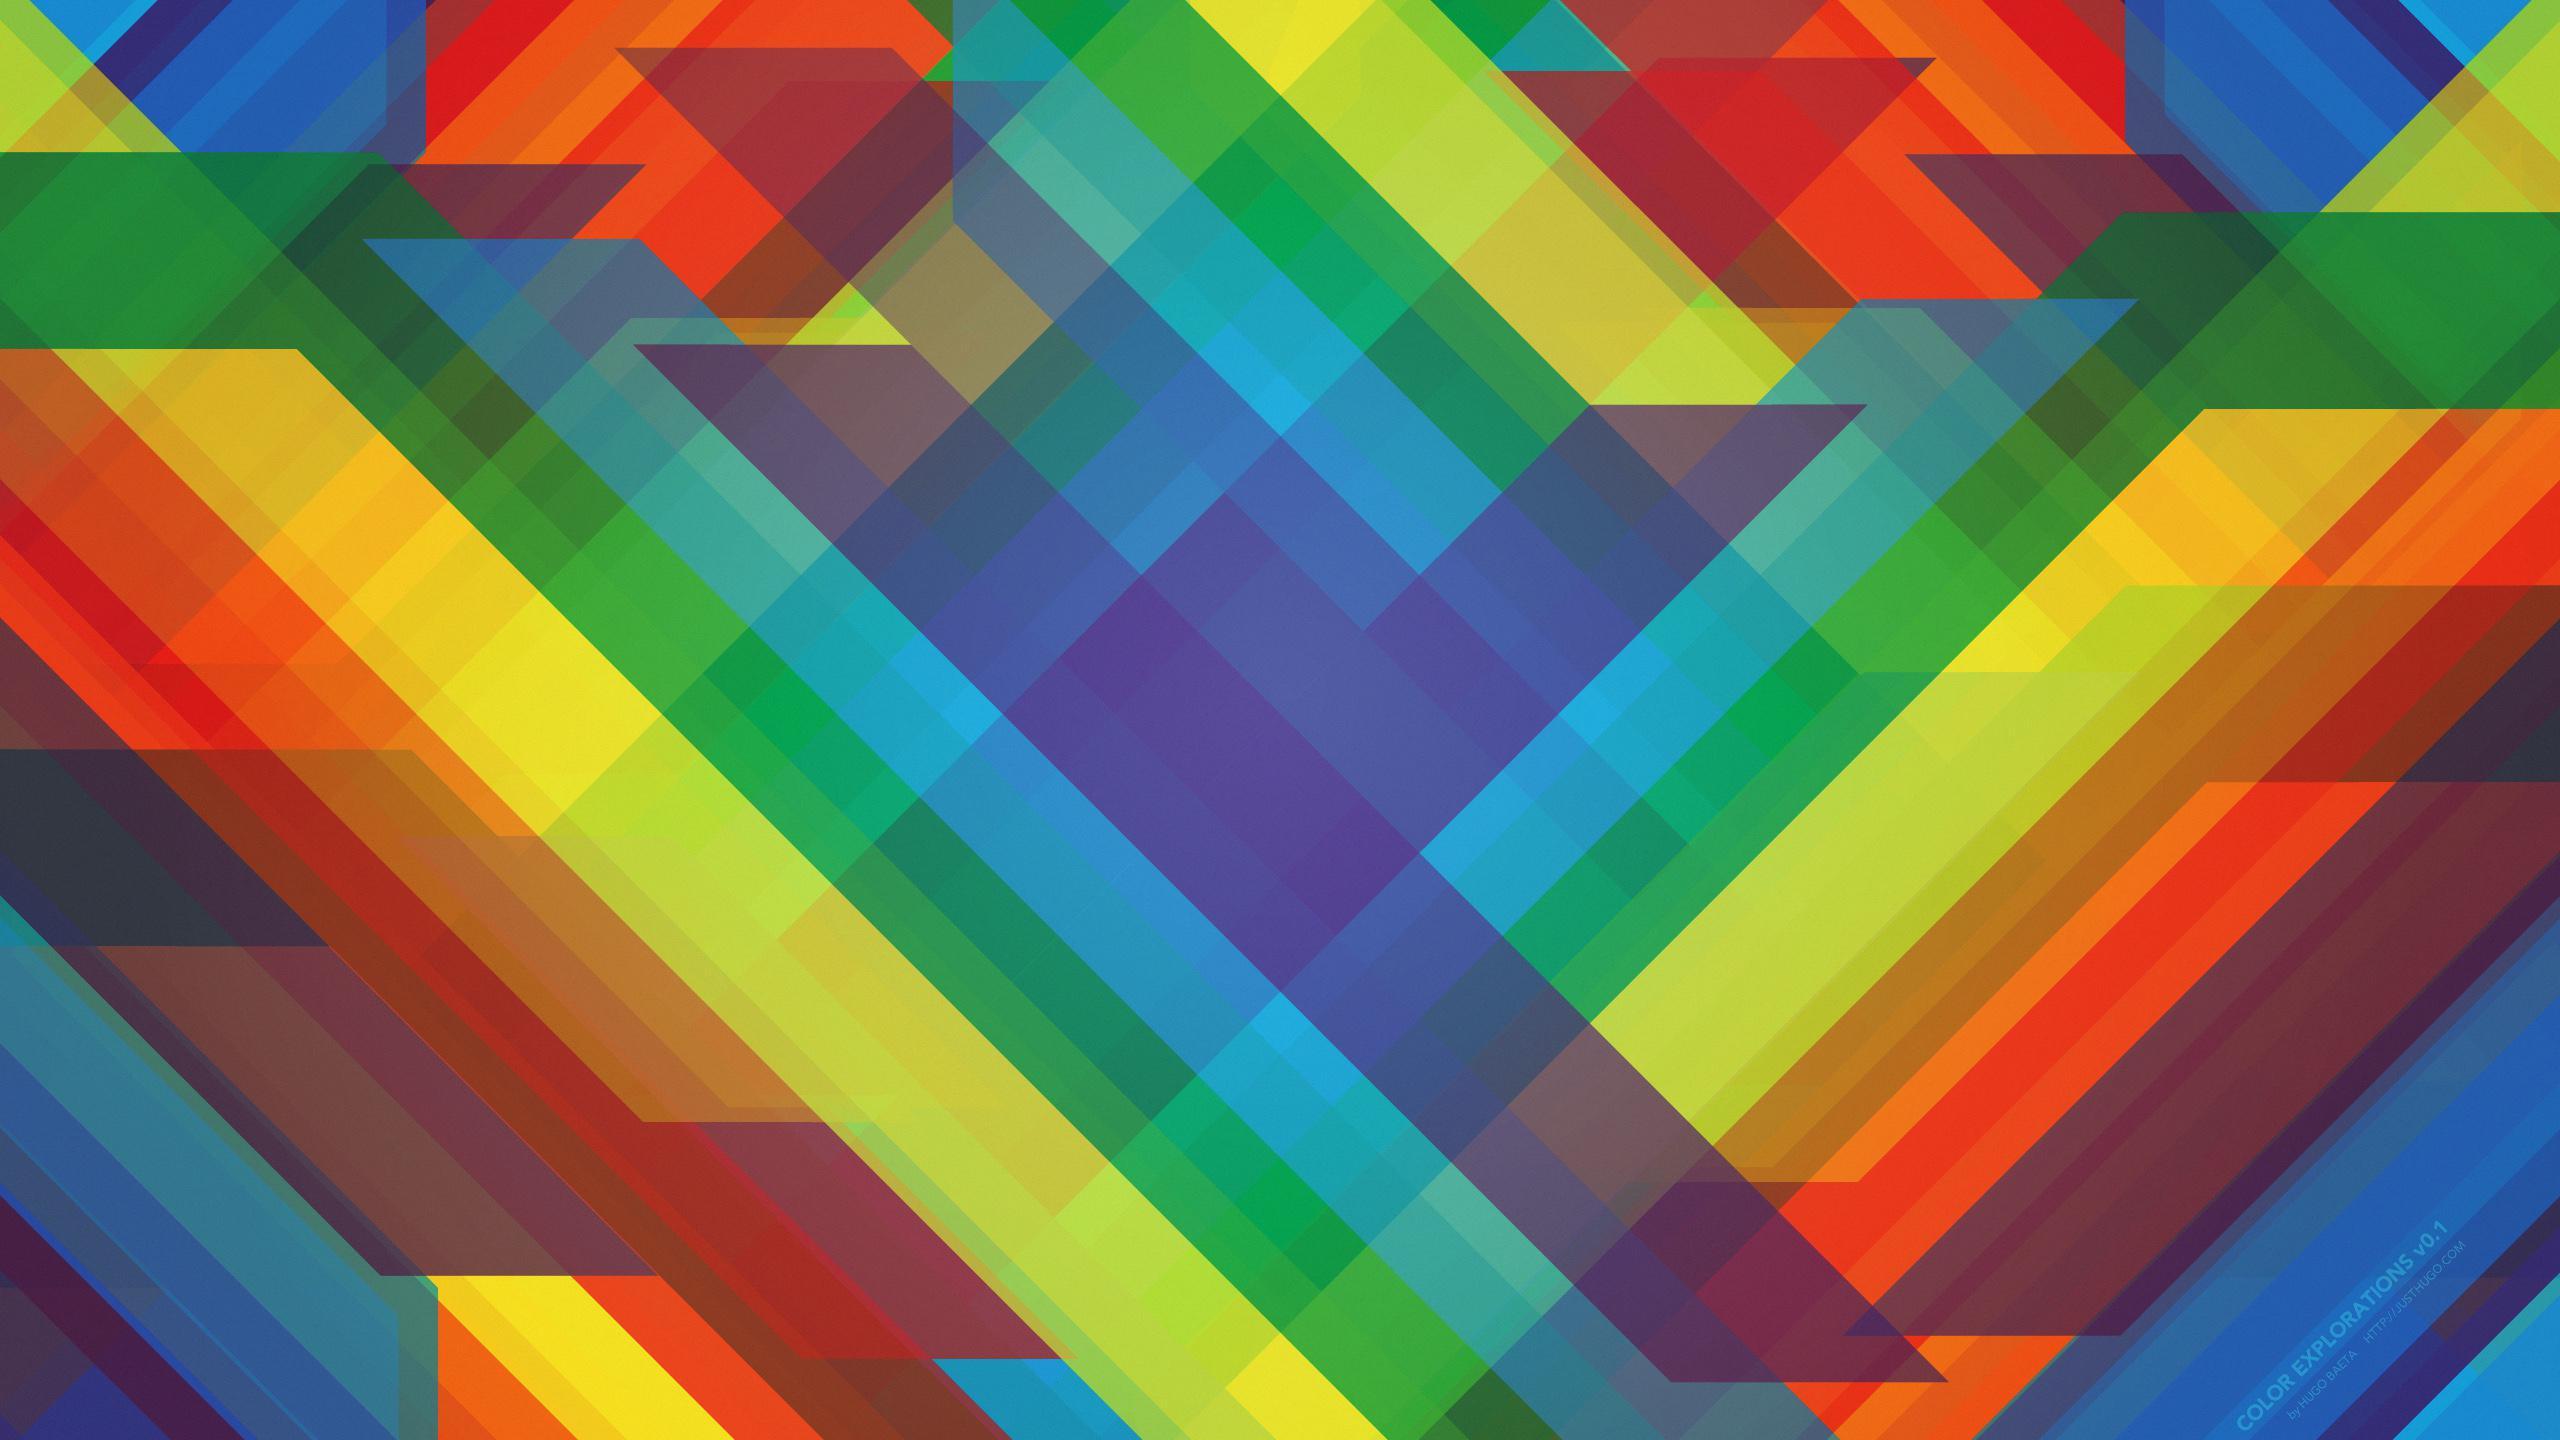 Funky Wallpapers HD 2560x1440